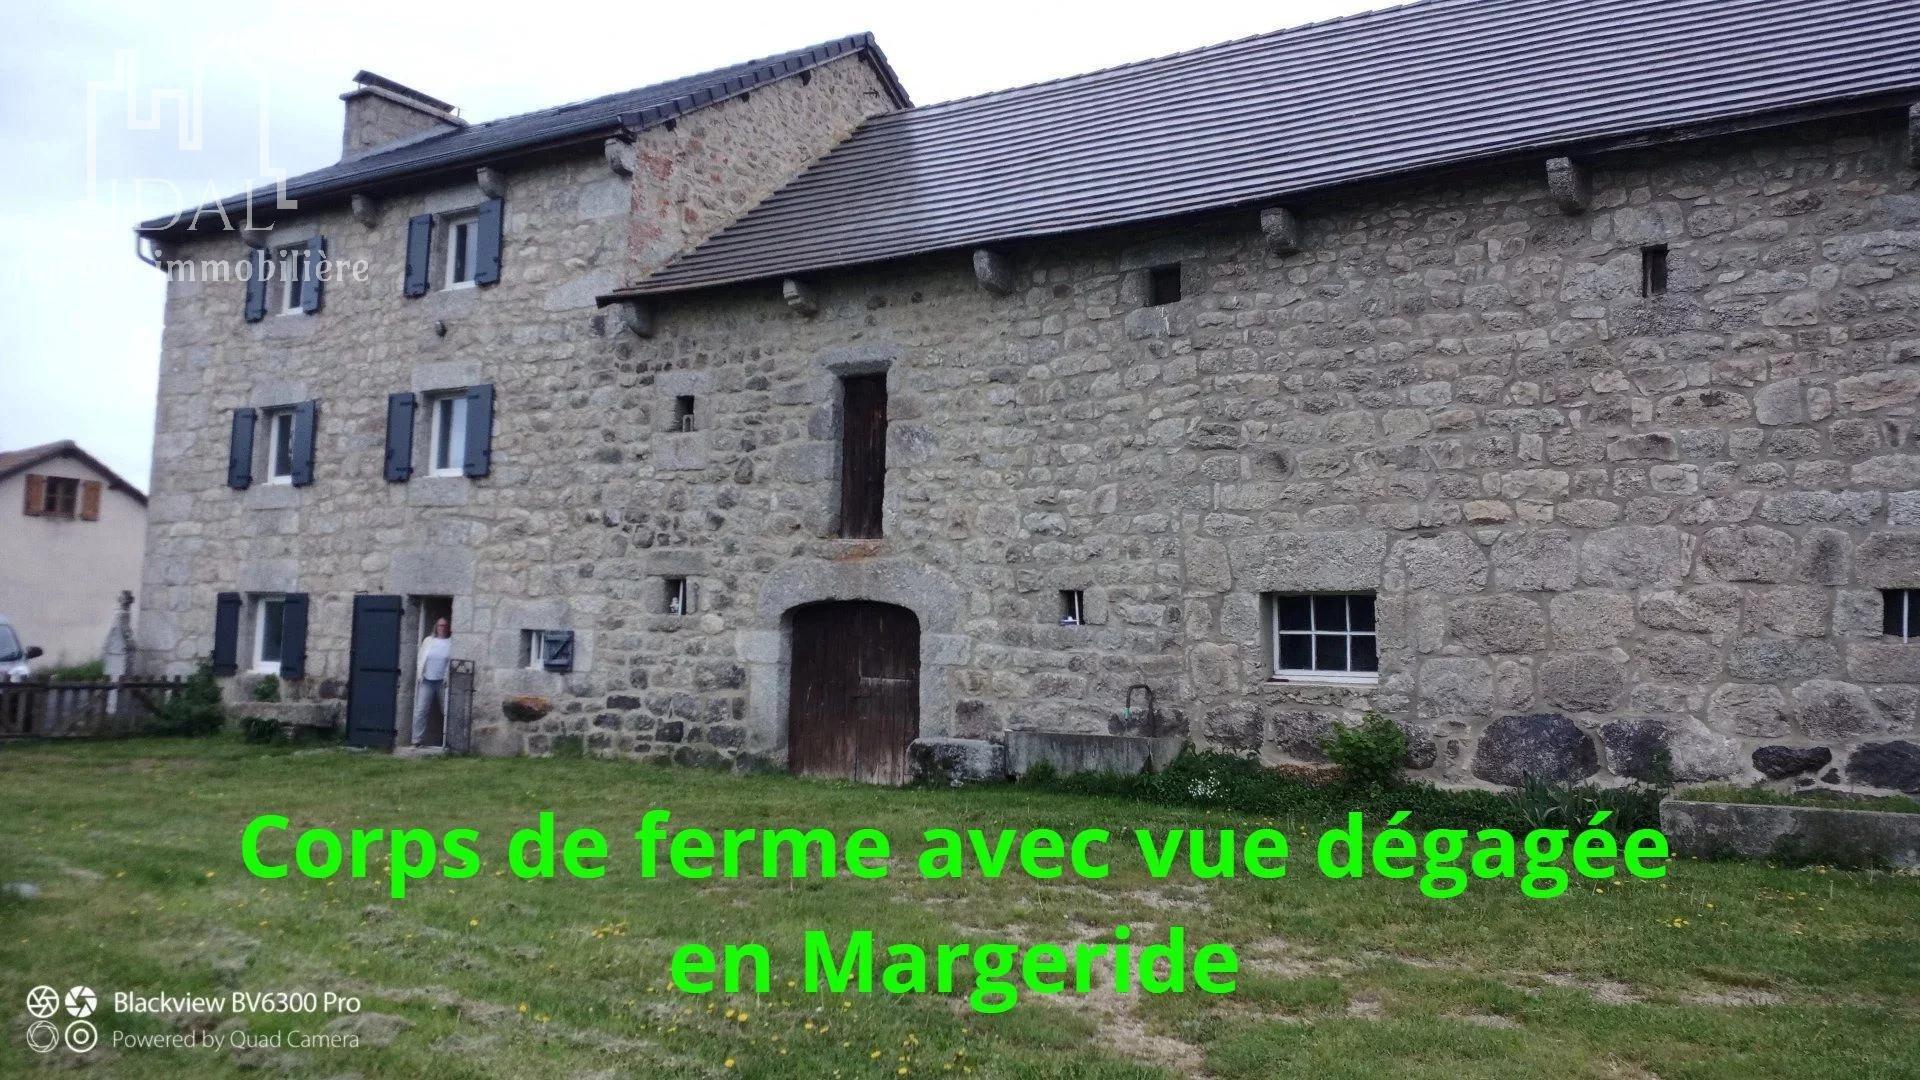 CORPS DE FERME EN MARGERIDE